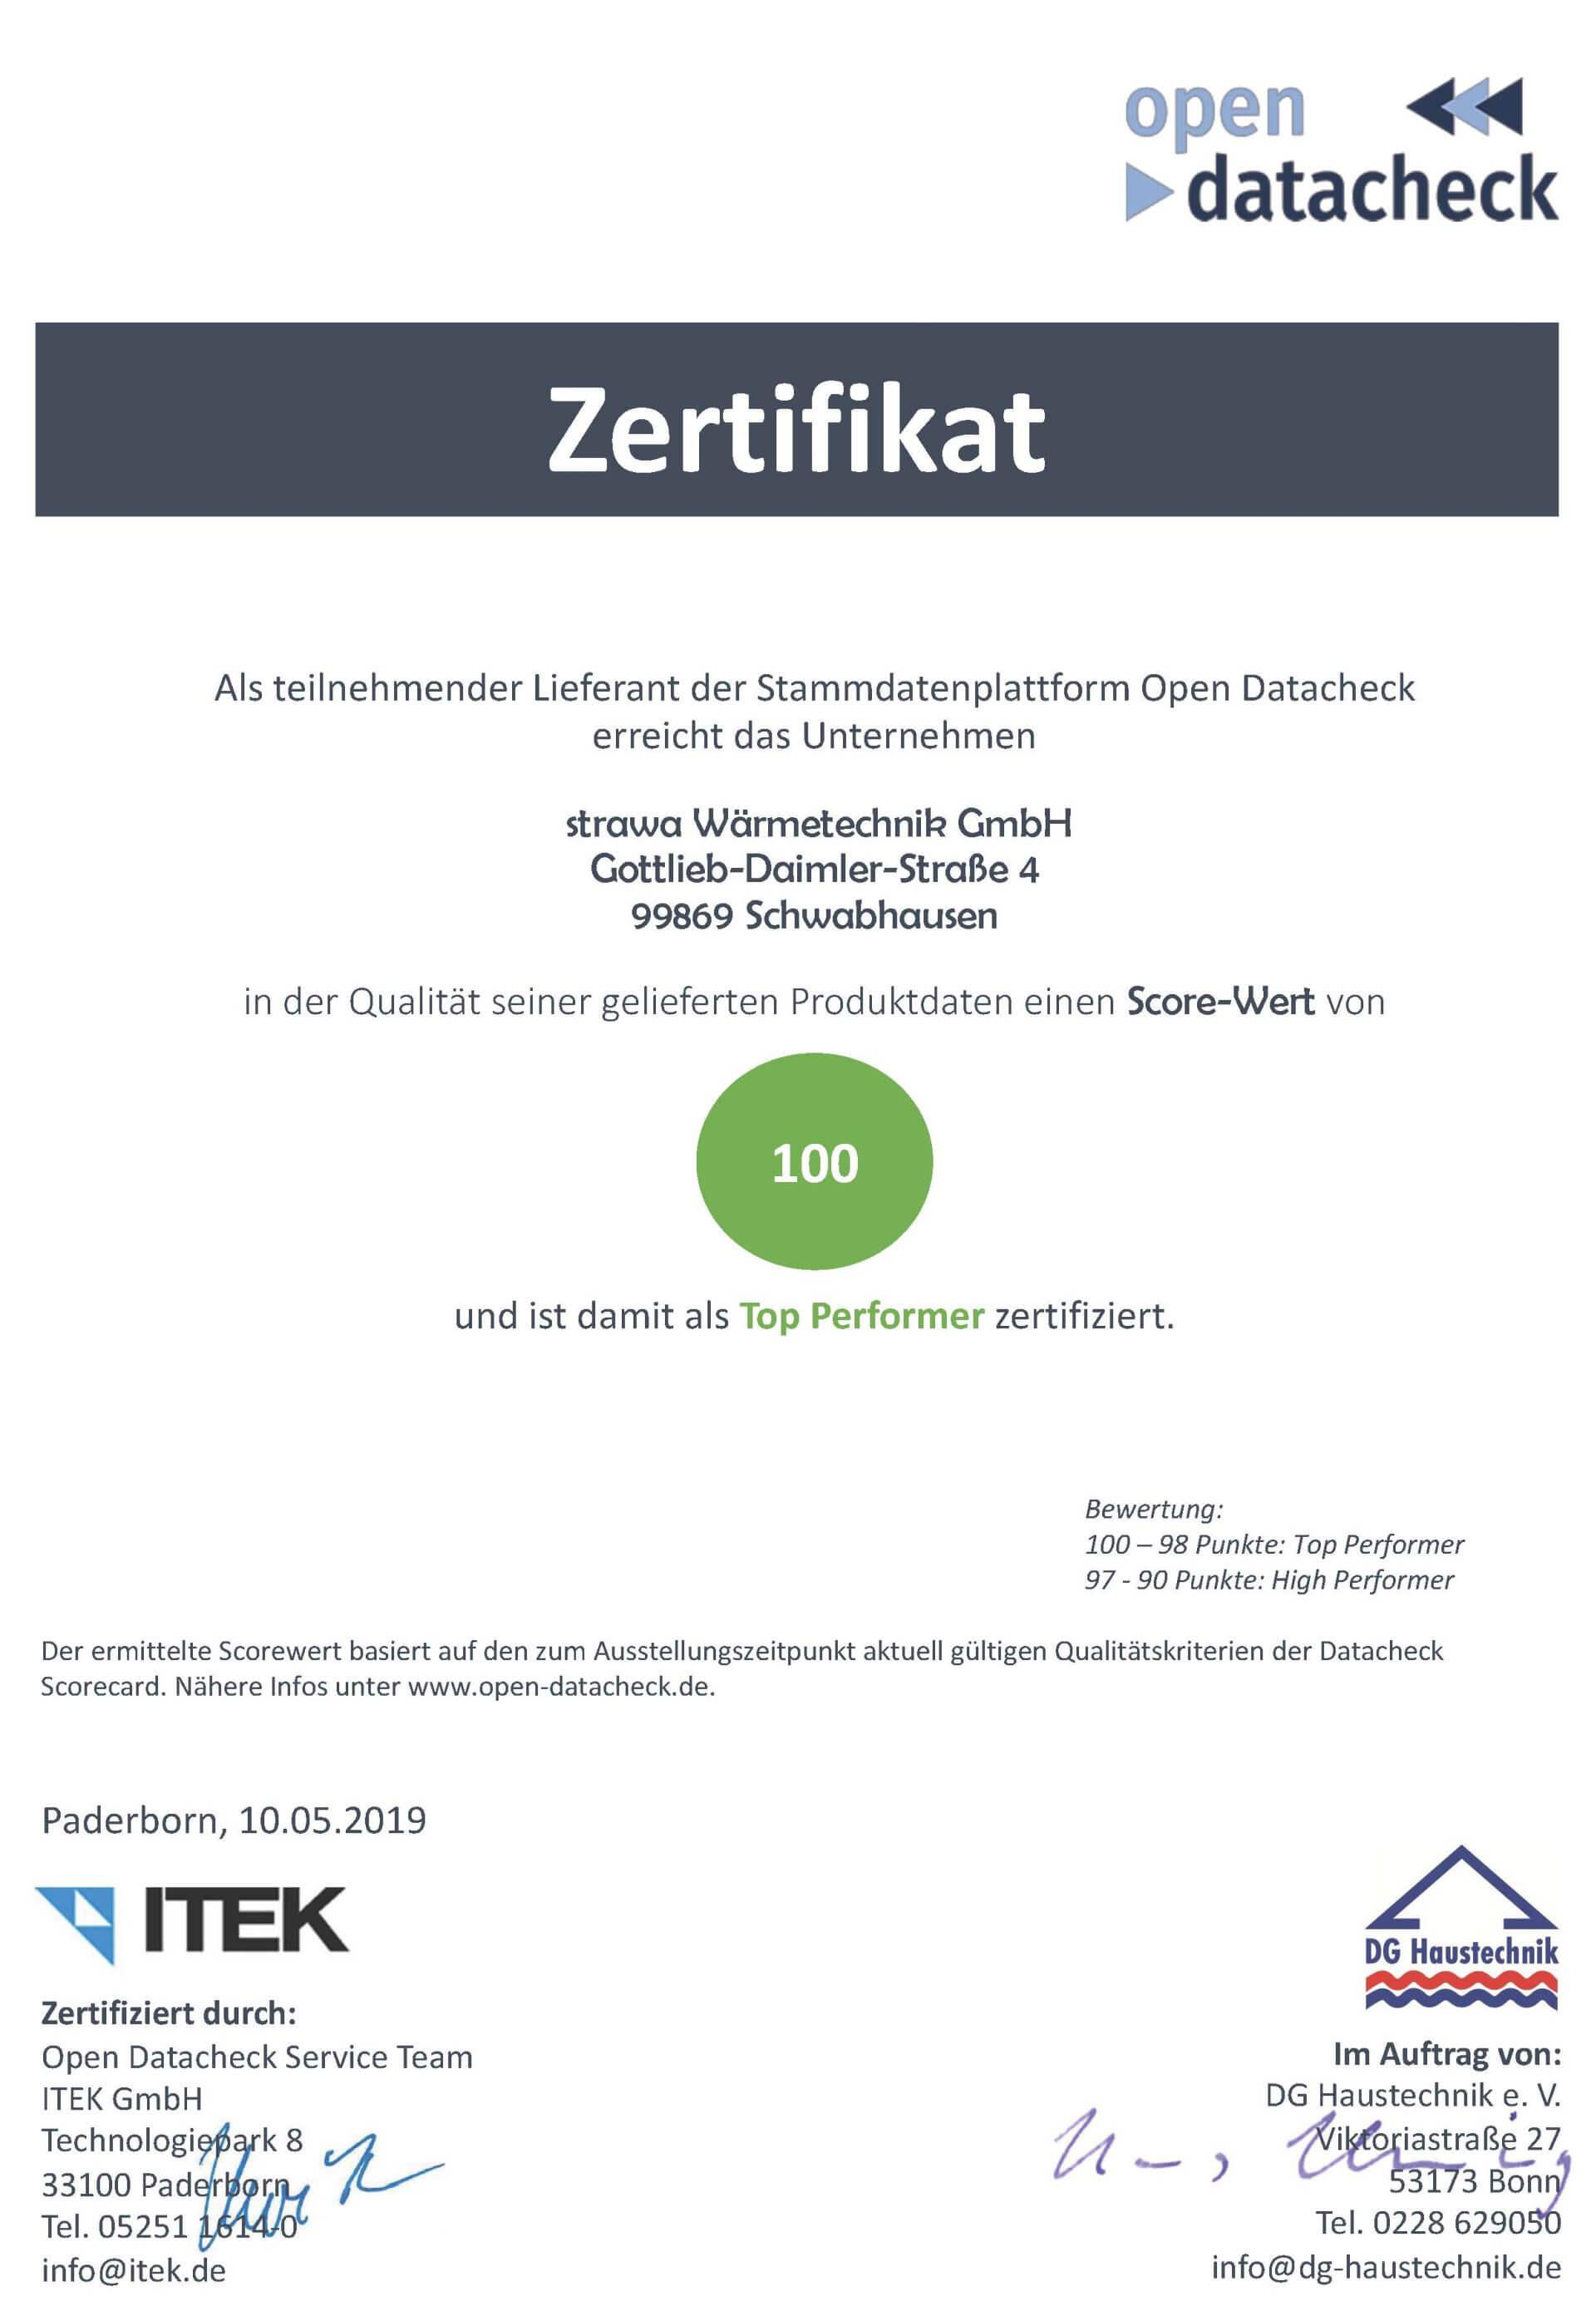 Datacheck Zertifikat strawa Wärmetechnik GmbH